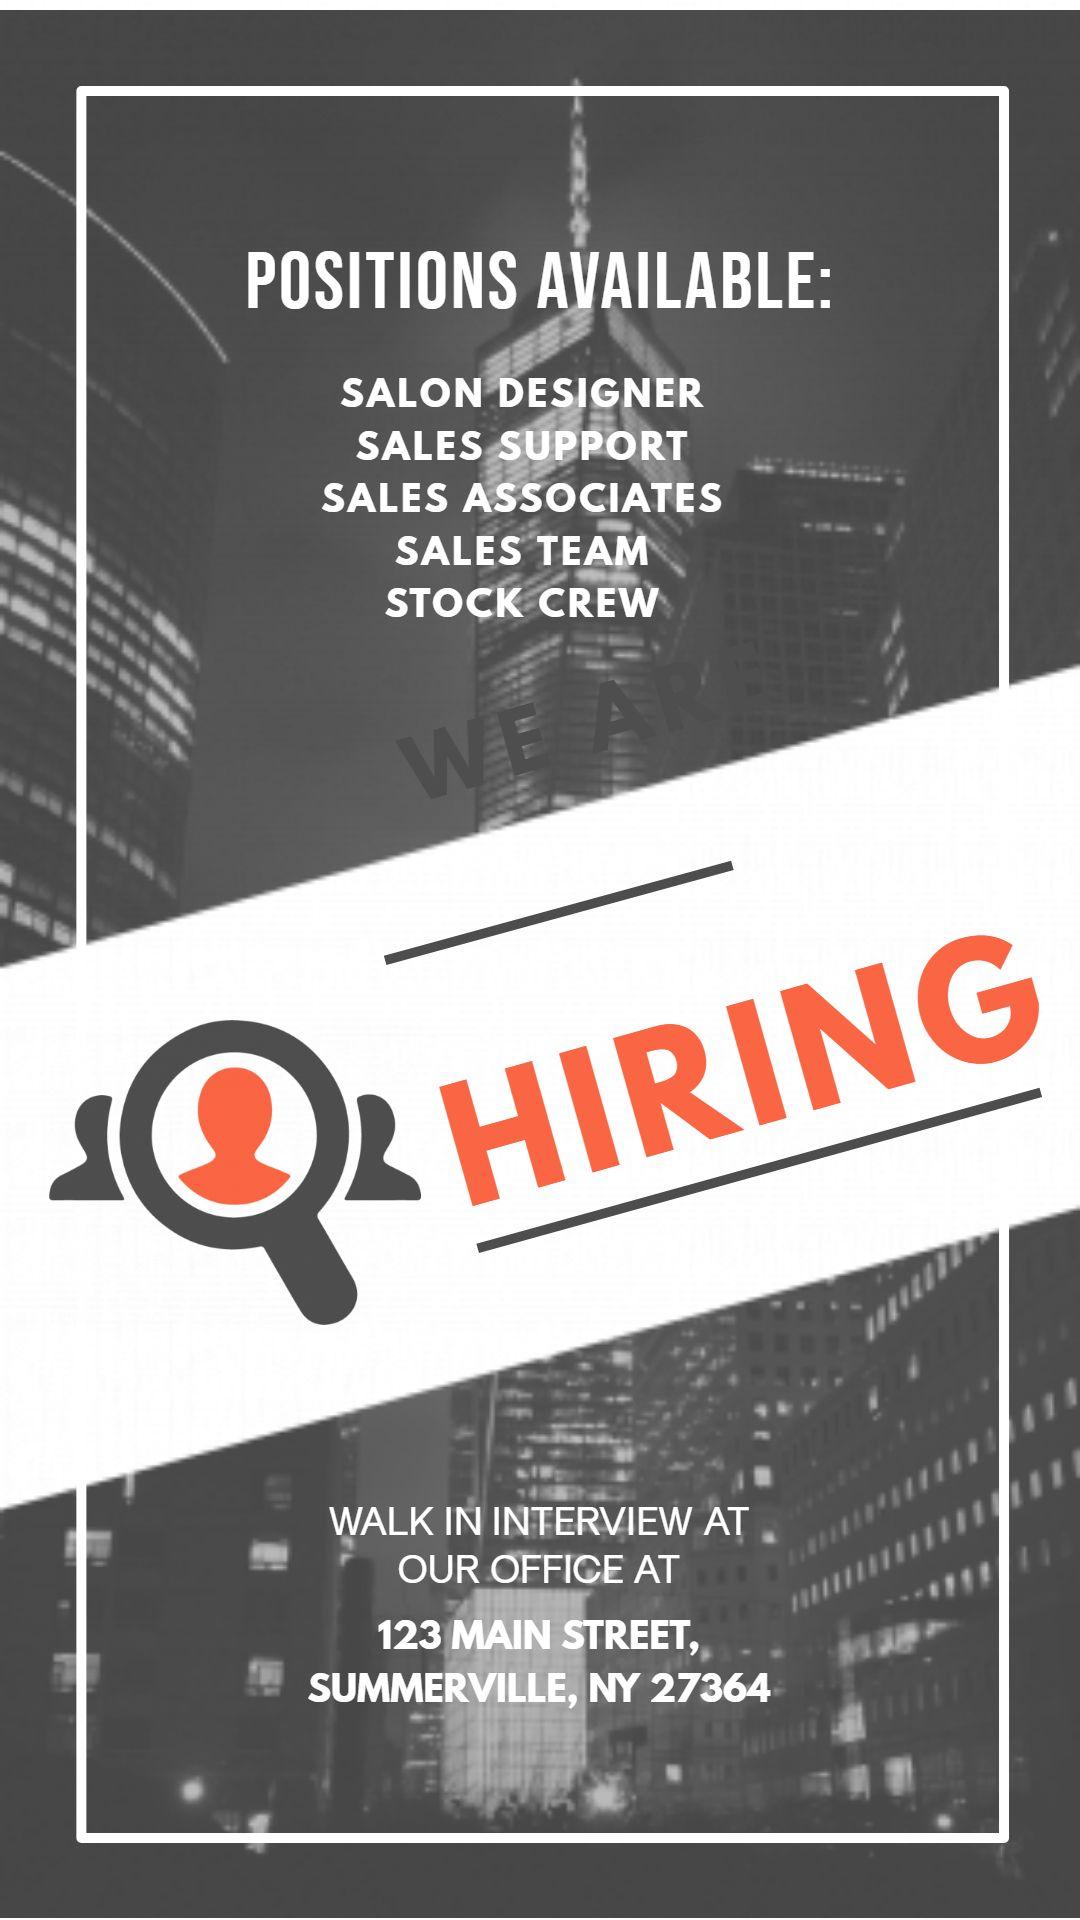 Job hiring bw instagram story ad template instagram